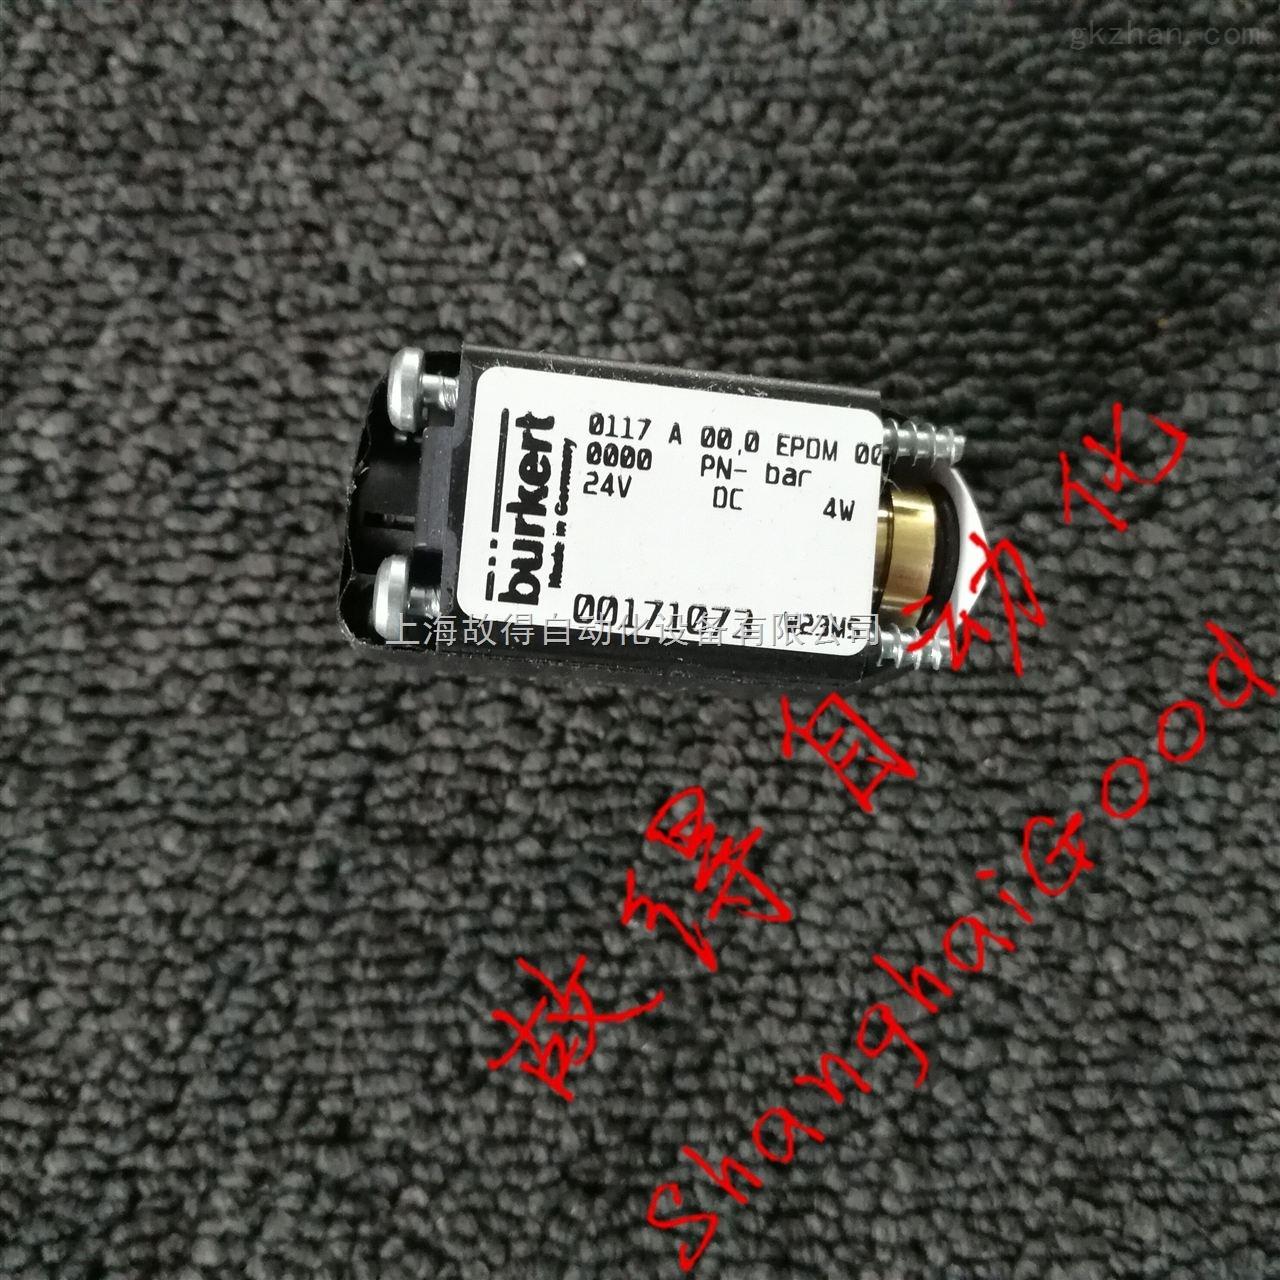 burkert 00171073 电磁阀0117